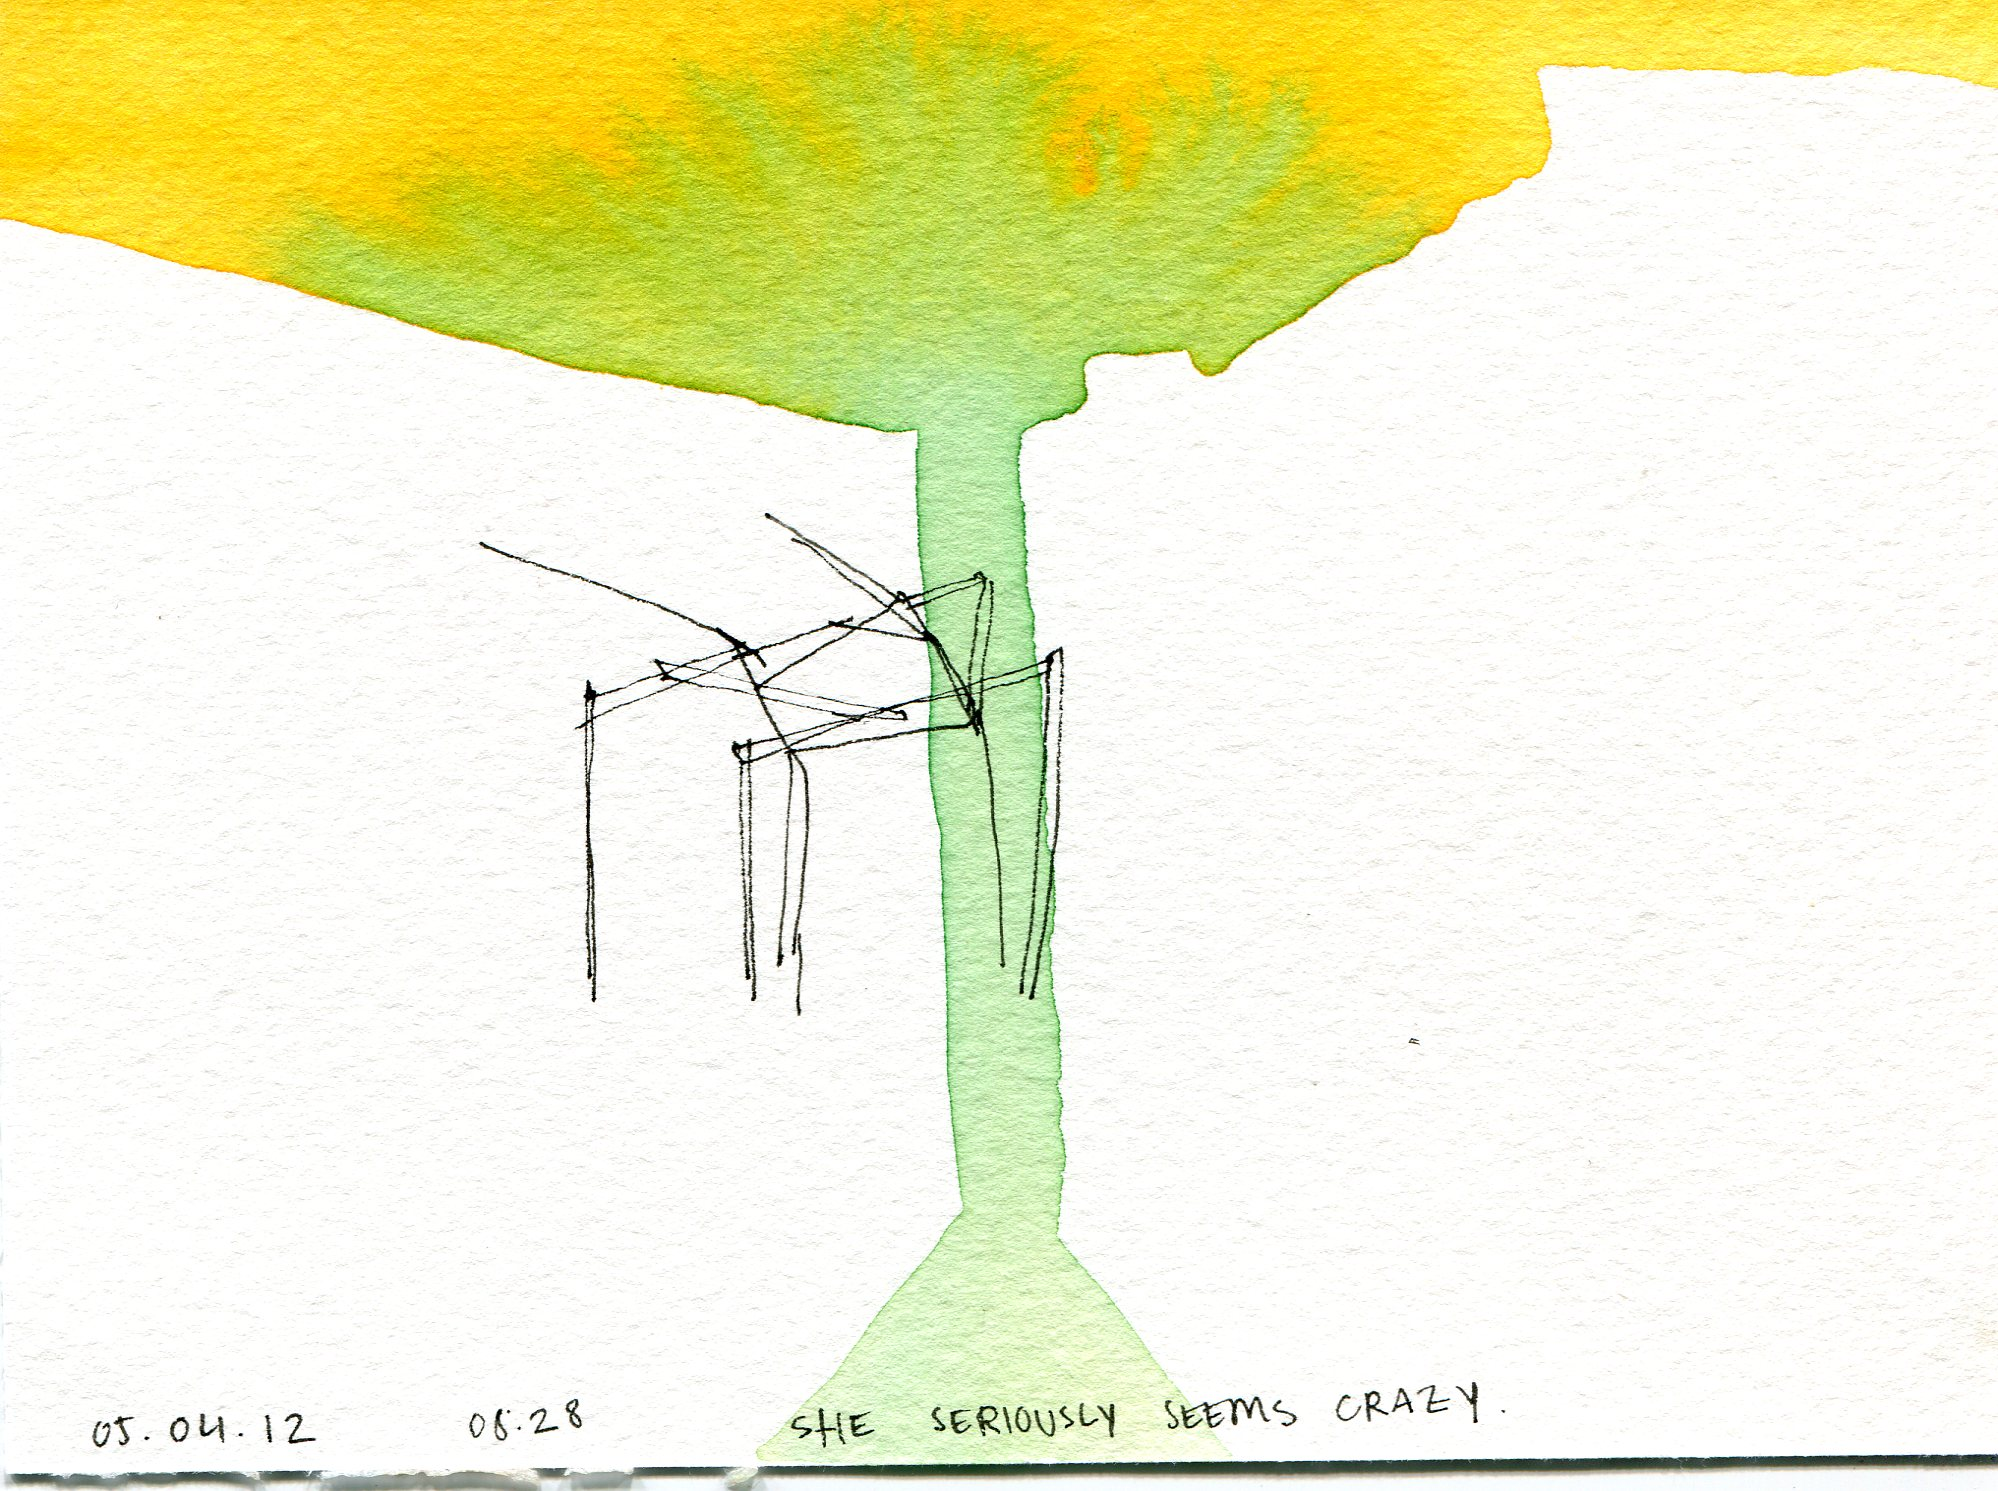 2012-05-05 drawing006.jpg